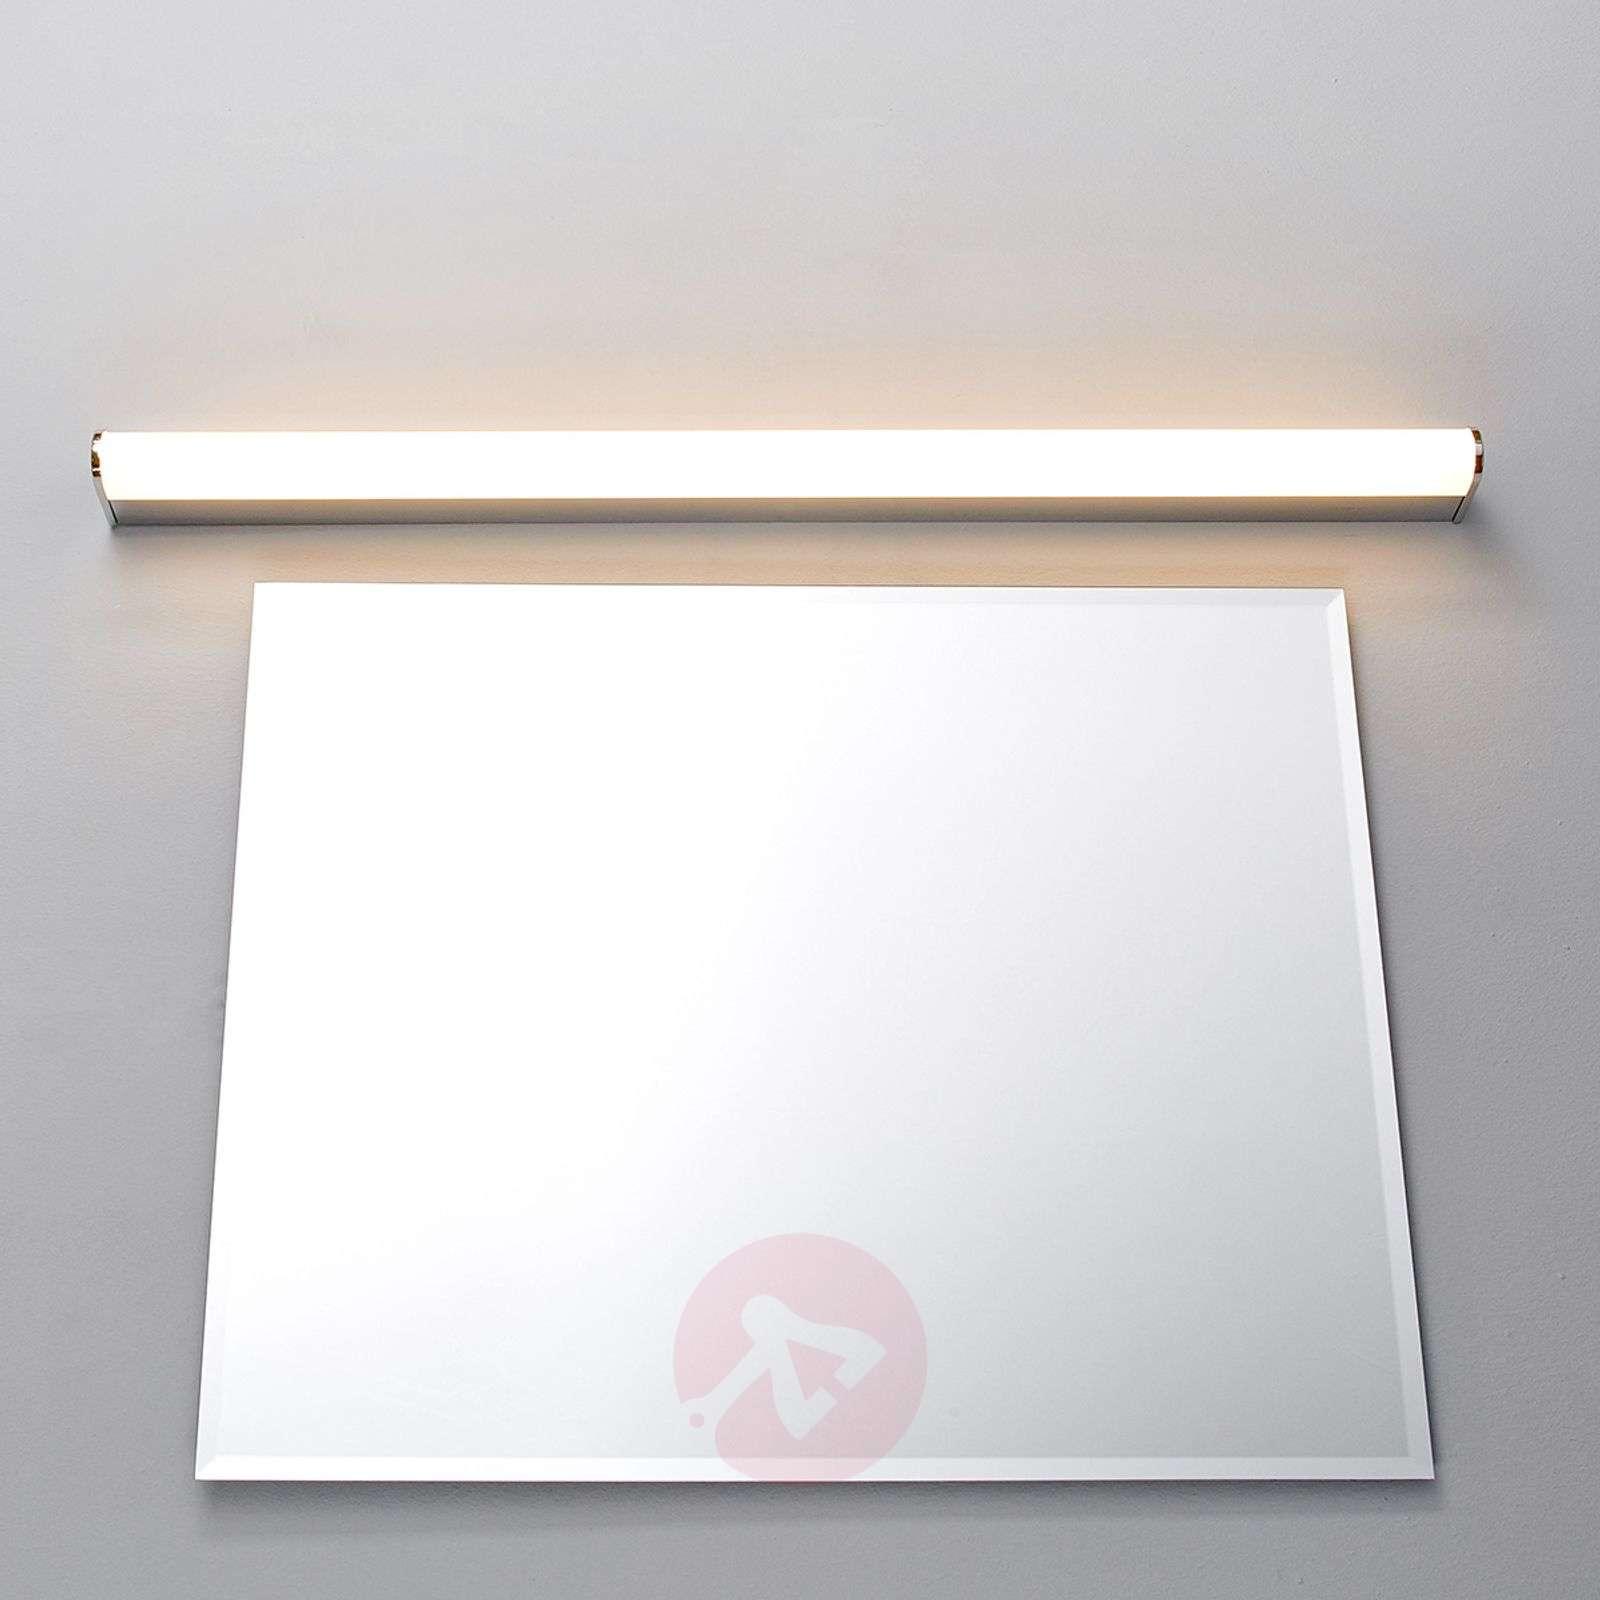 Philippa LED Bathroom Light Semi-Circular-9641013-01